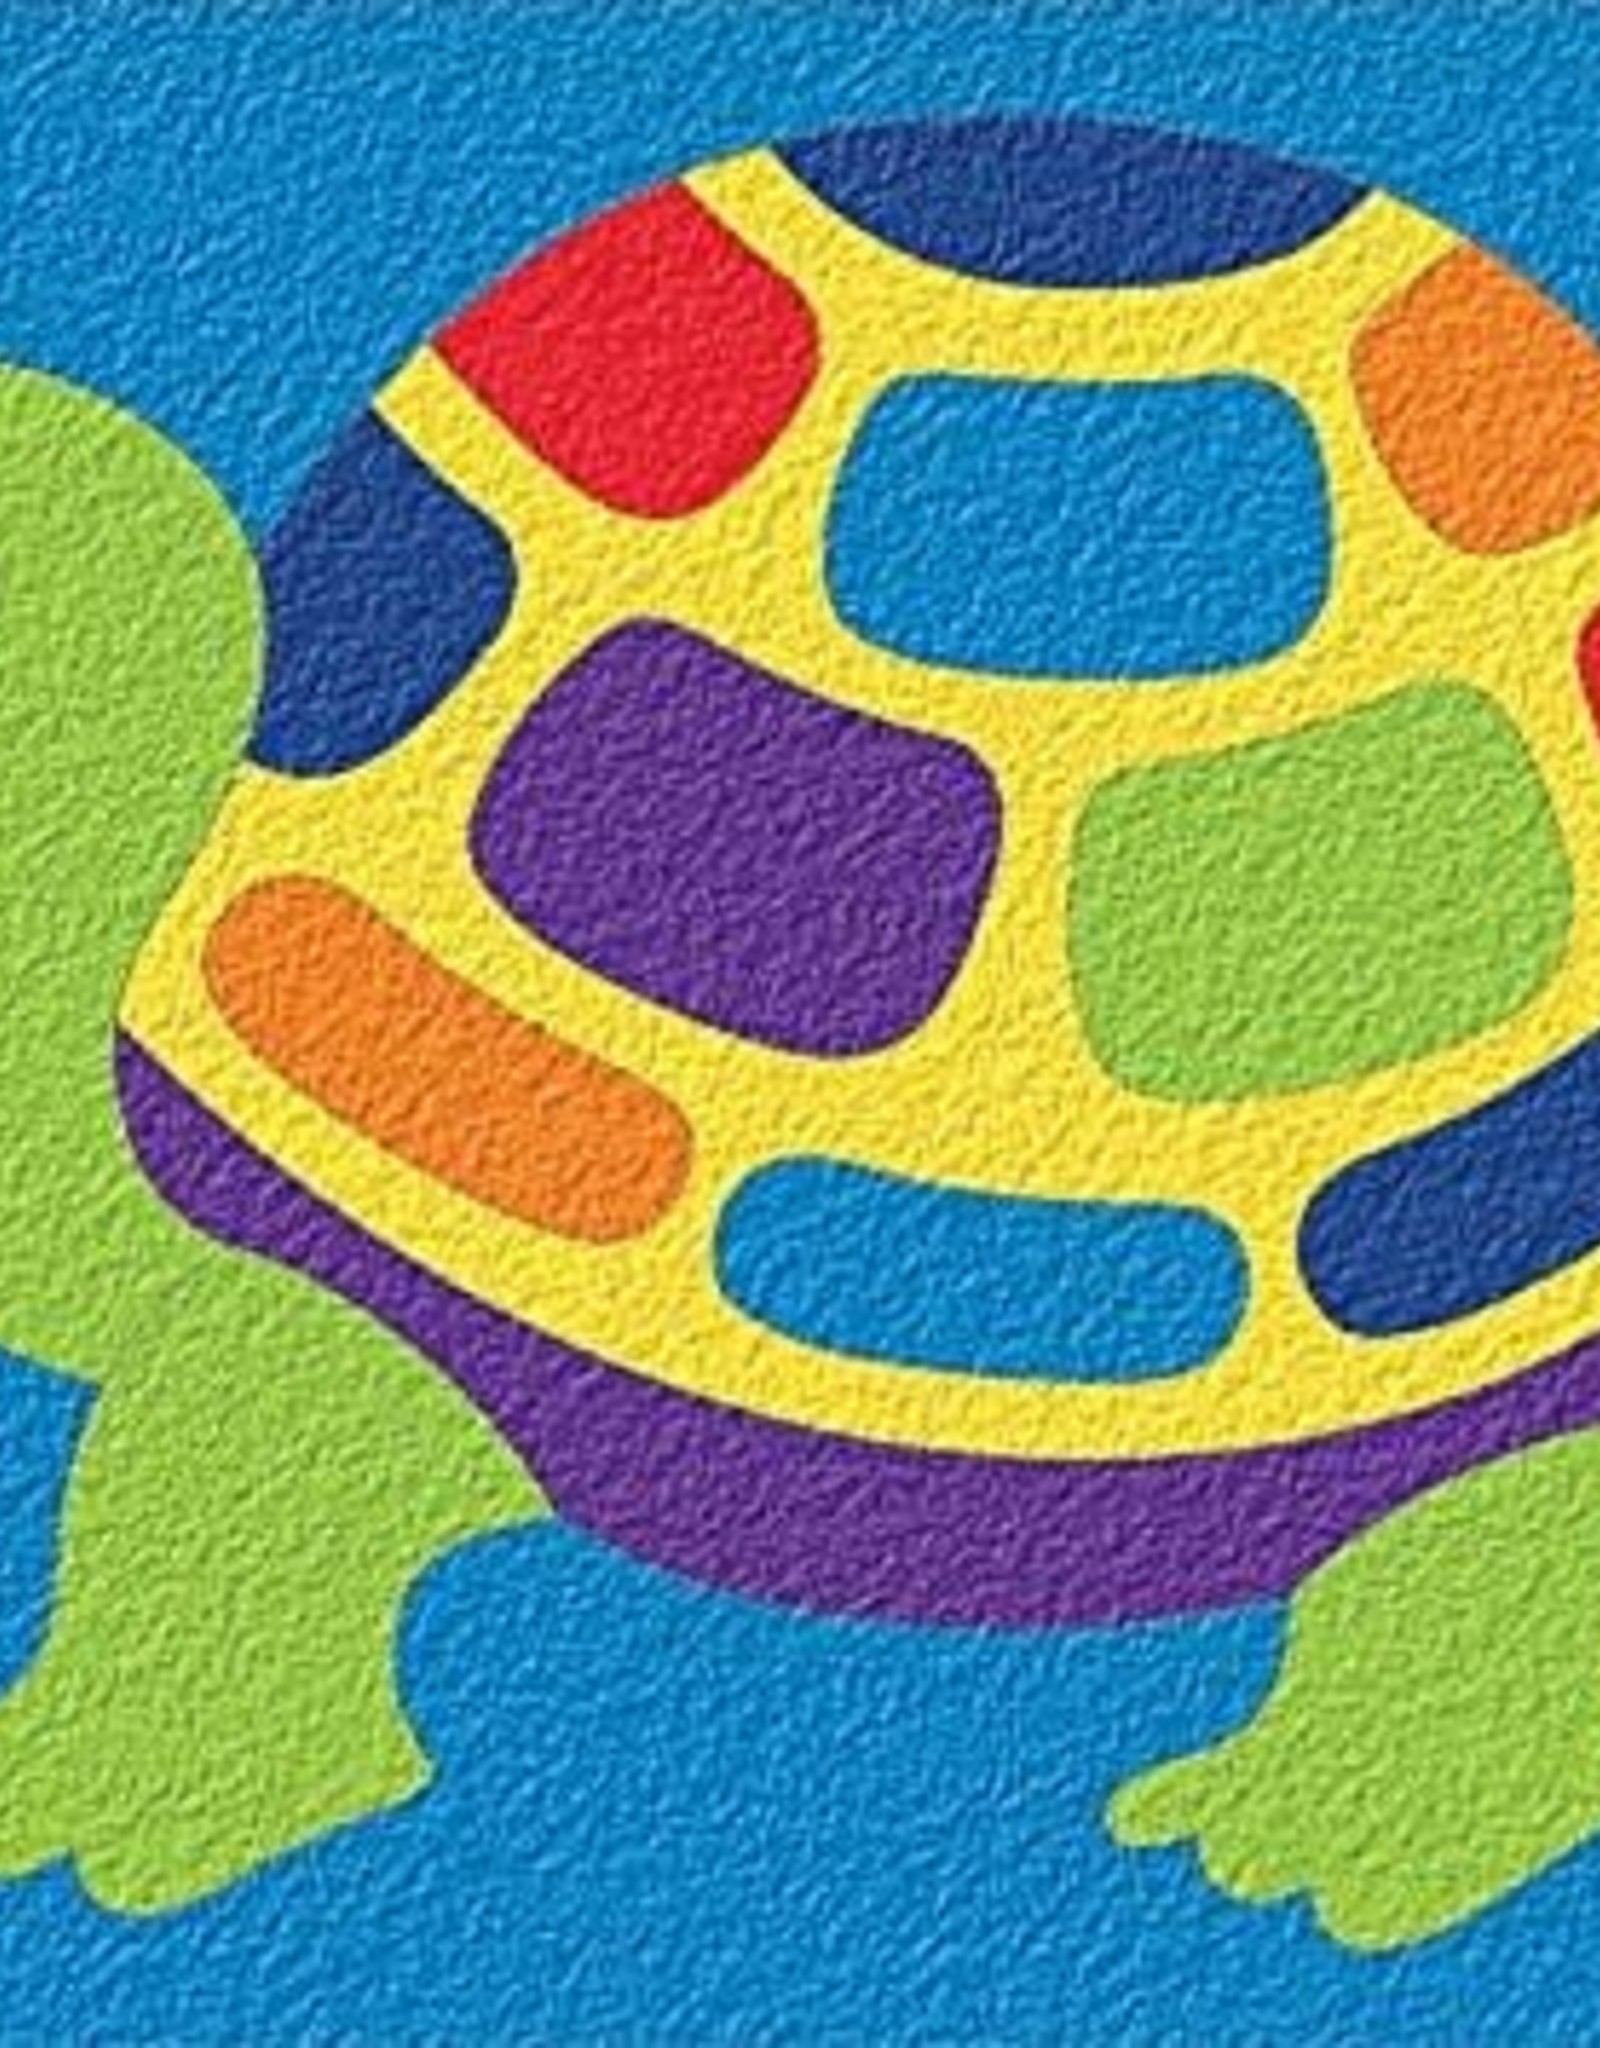 Lauri 18pc Crepe Rubber Puzzle Turtle